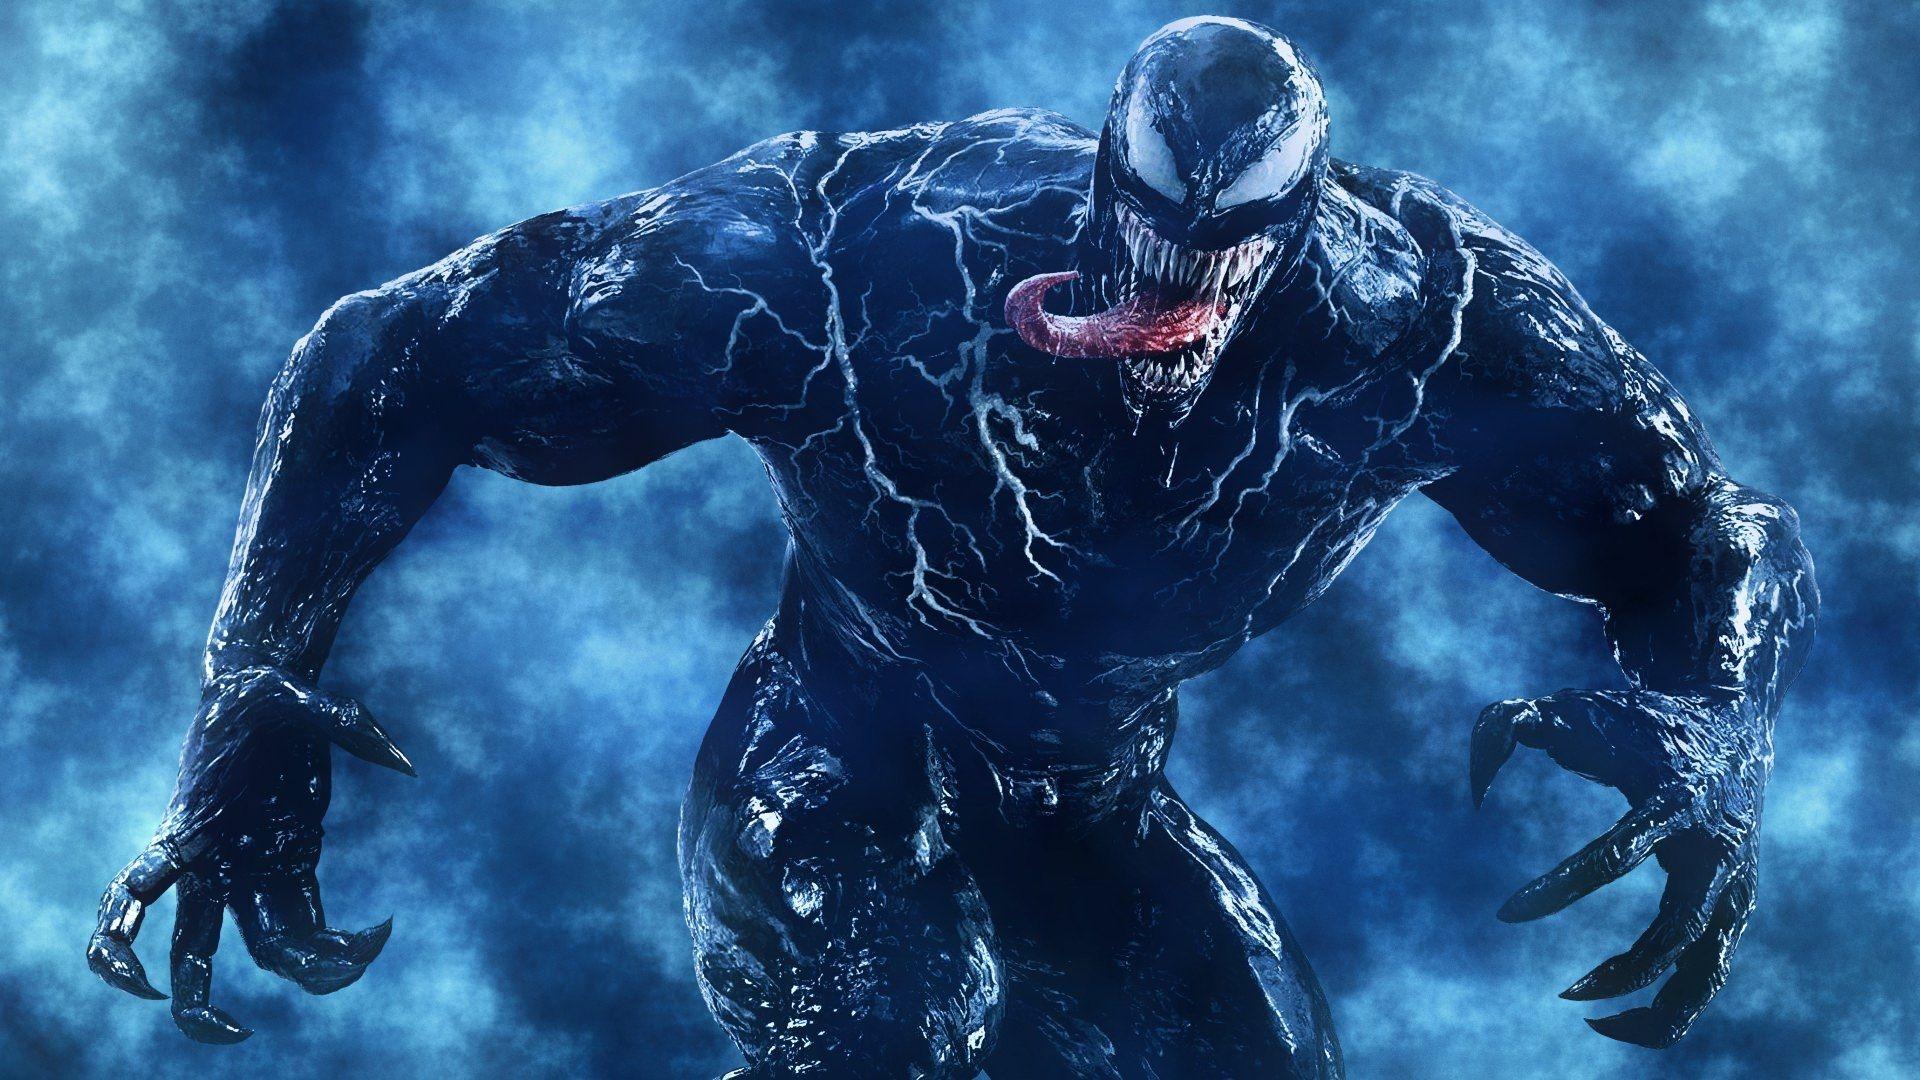 2020 Venom 2 Art Wallpaper, HD Movies 4K Wallpapers ...